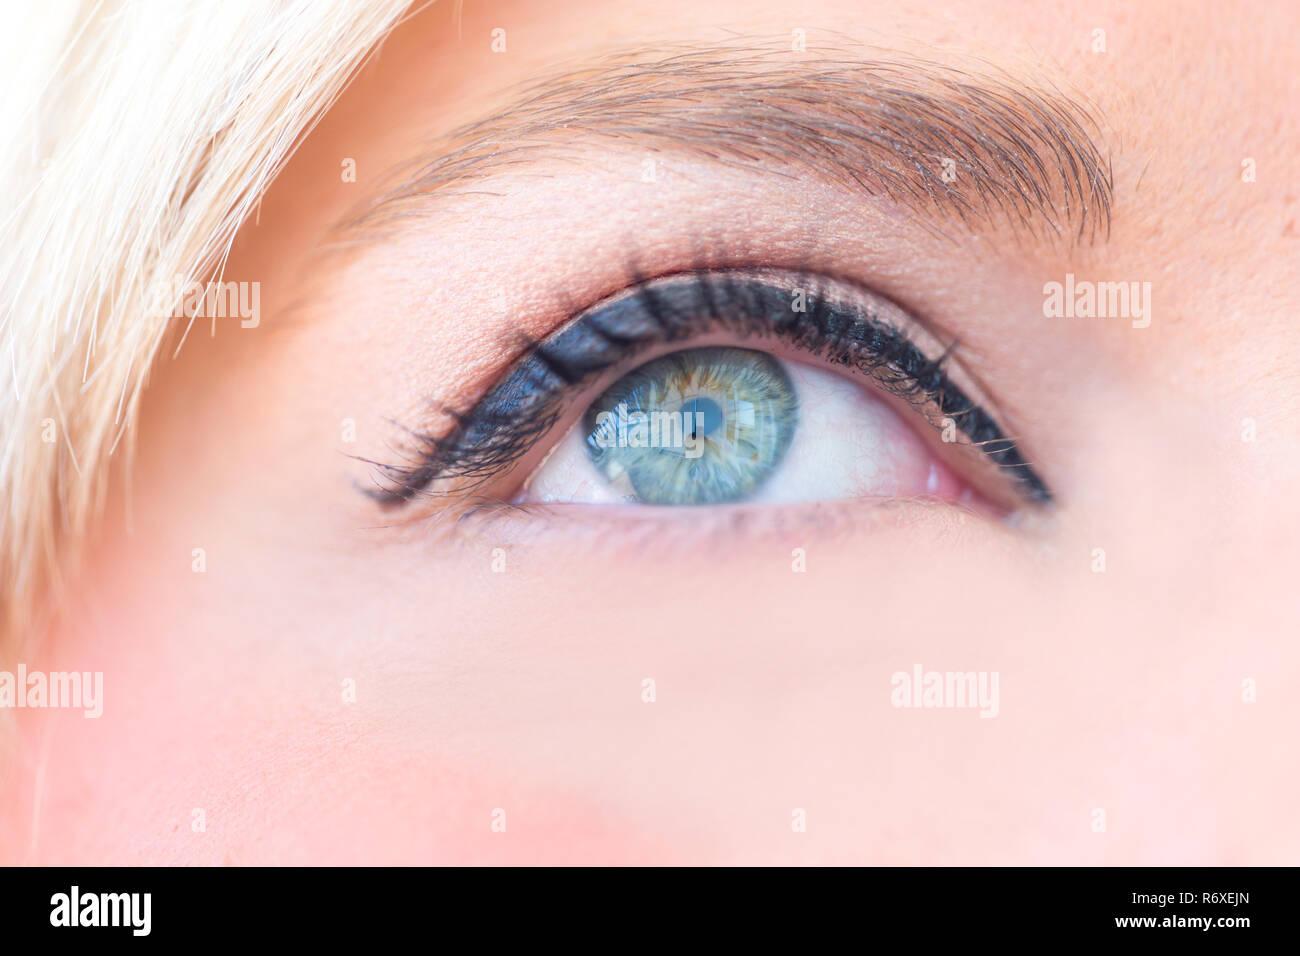 El ojo humano Foto & Imagen De Stock: 228004973 - Alamy